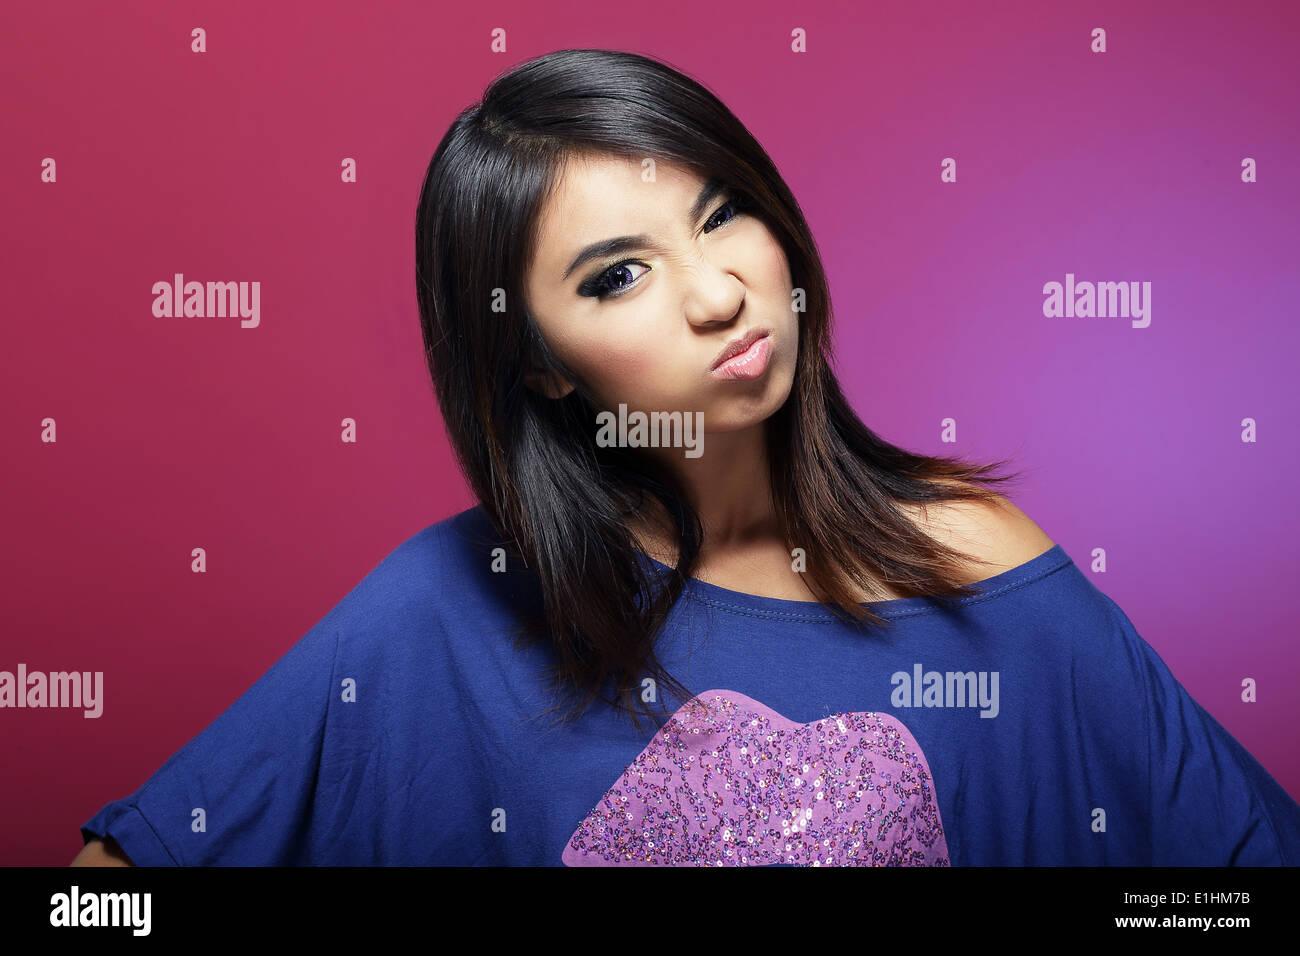 Antipathy. Discontented Asian Woman Grimacing - Stock Image